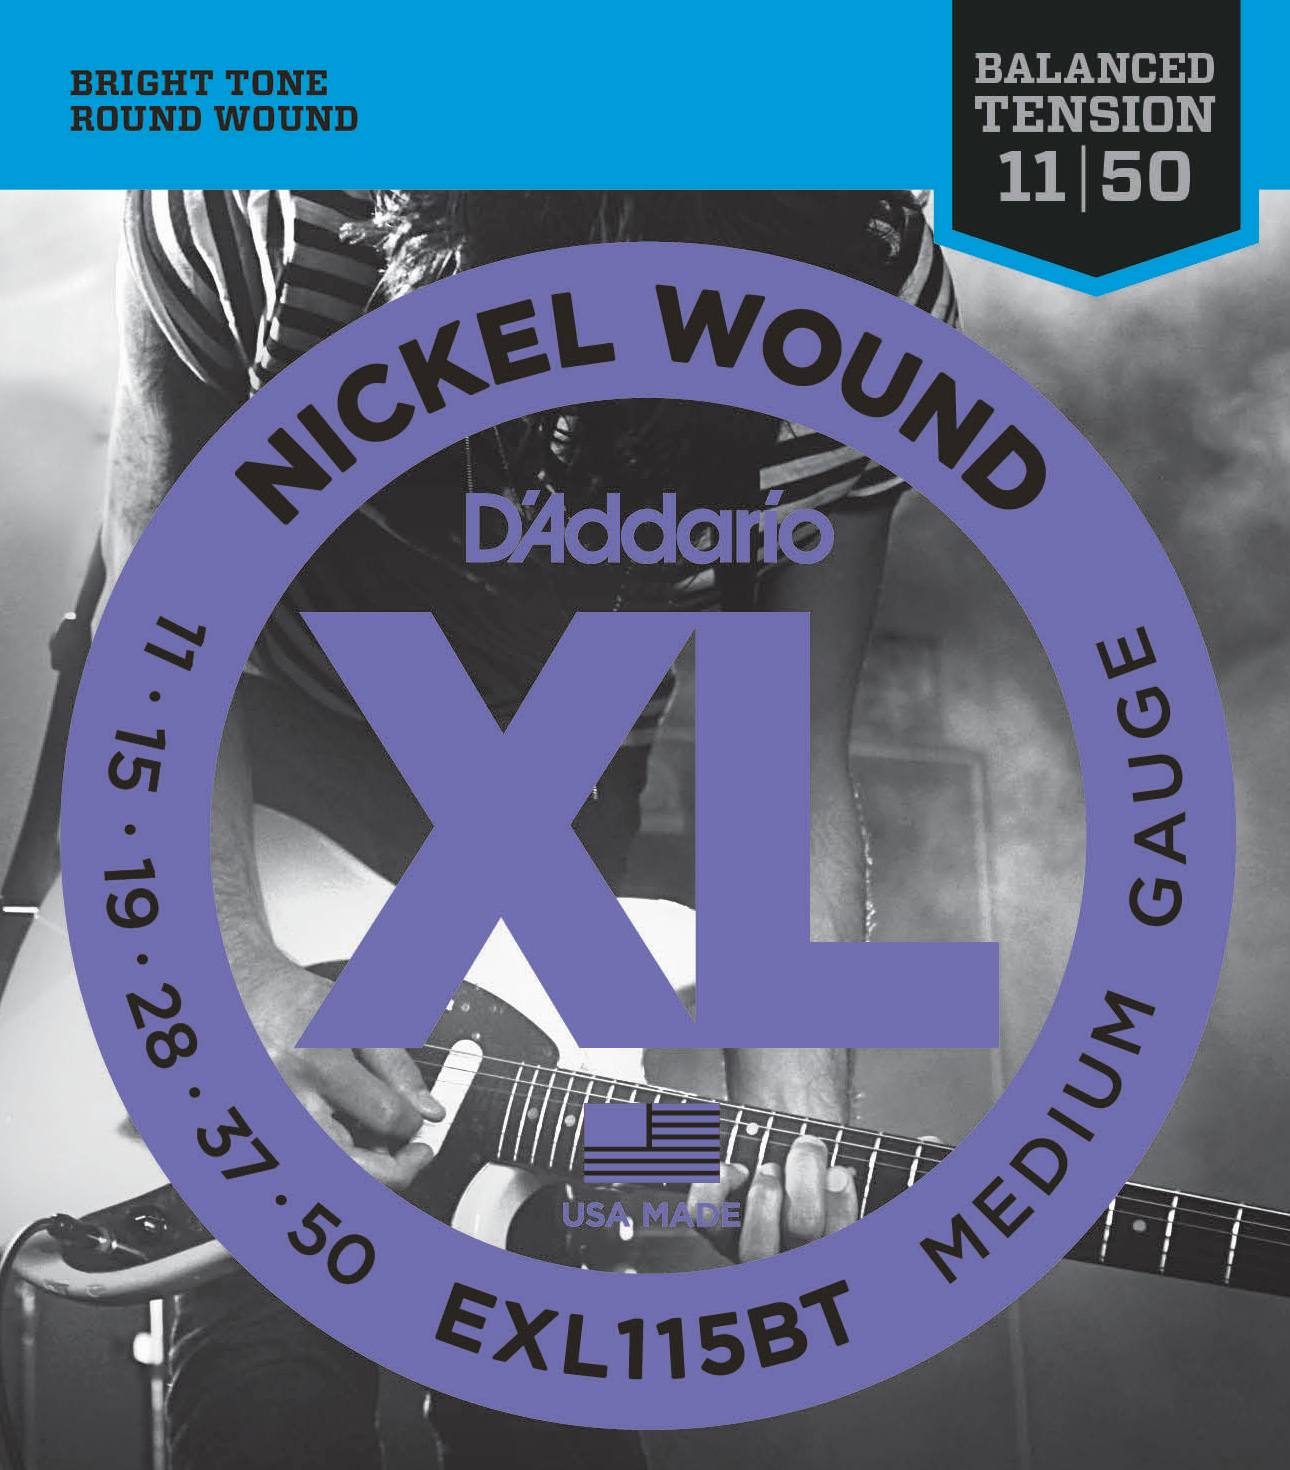 Daddario EXL115BT Saitensatz für E-Gitarre 011-050